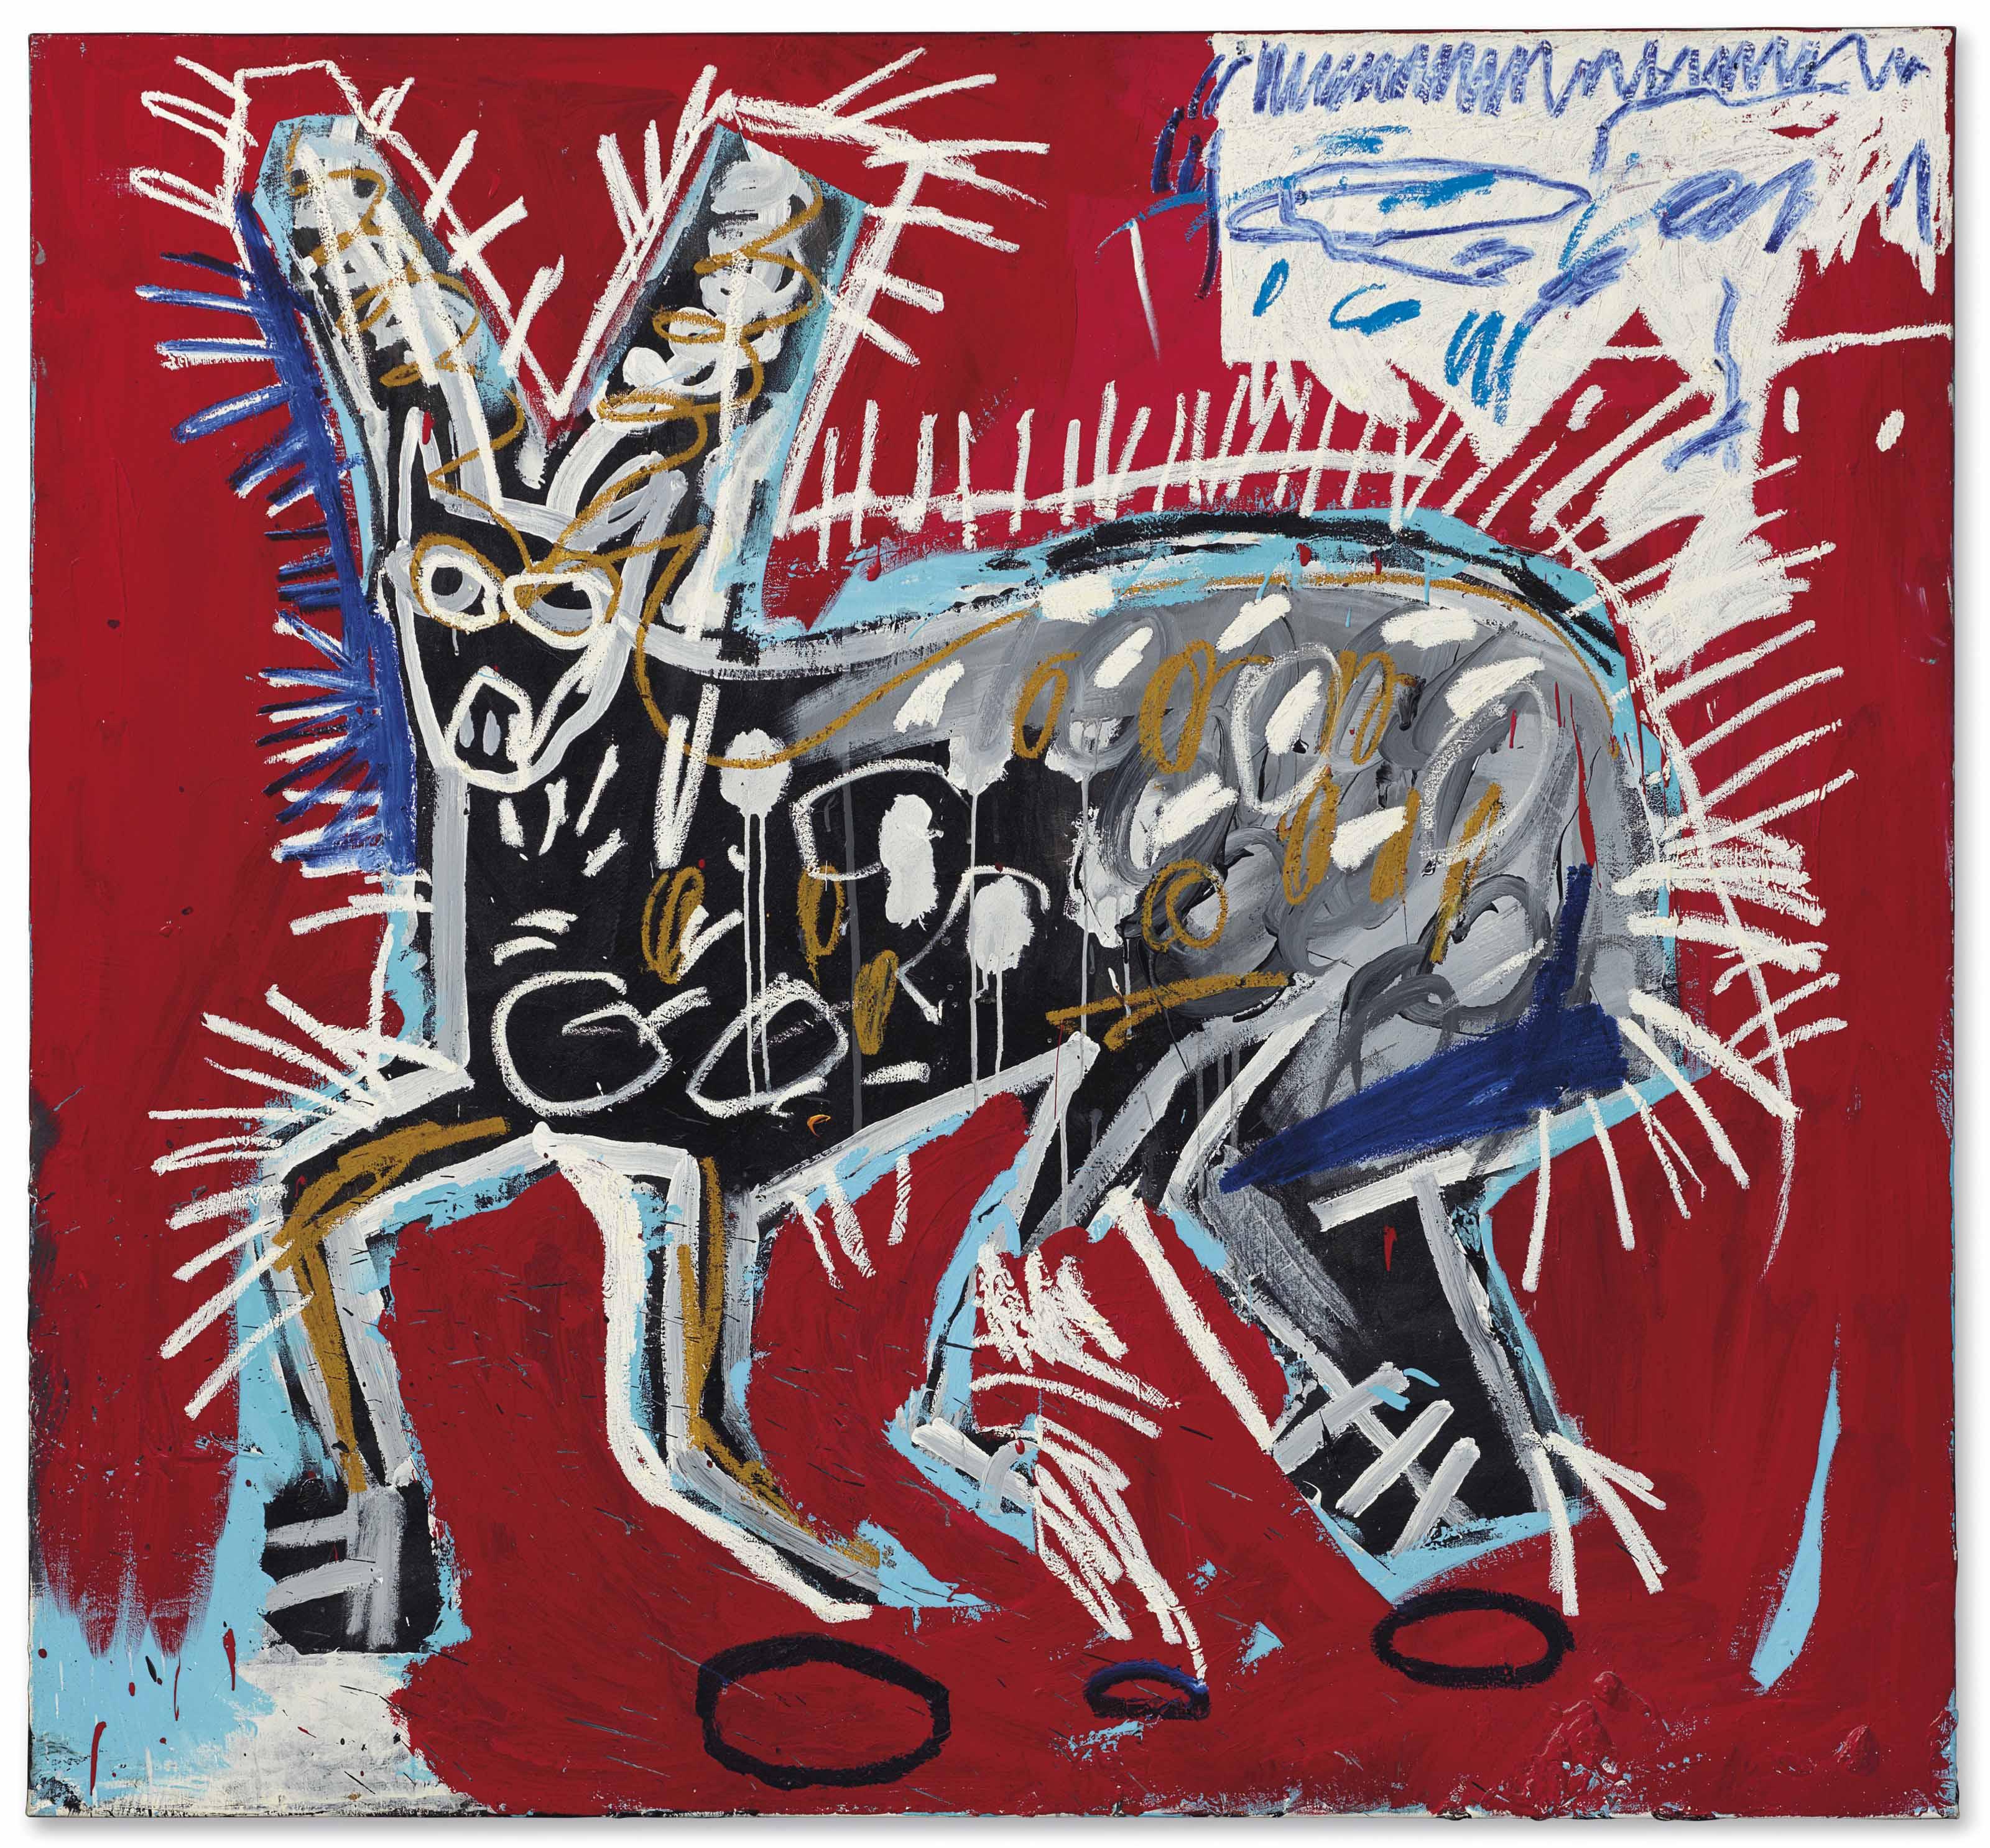 Jean Michel Basquiat 1960 1988 Red Rabbit 1980s